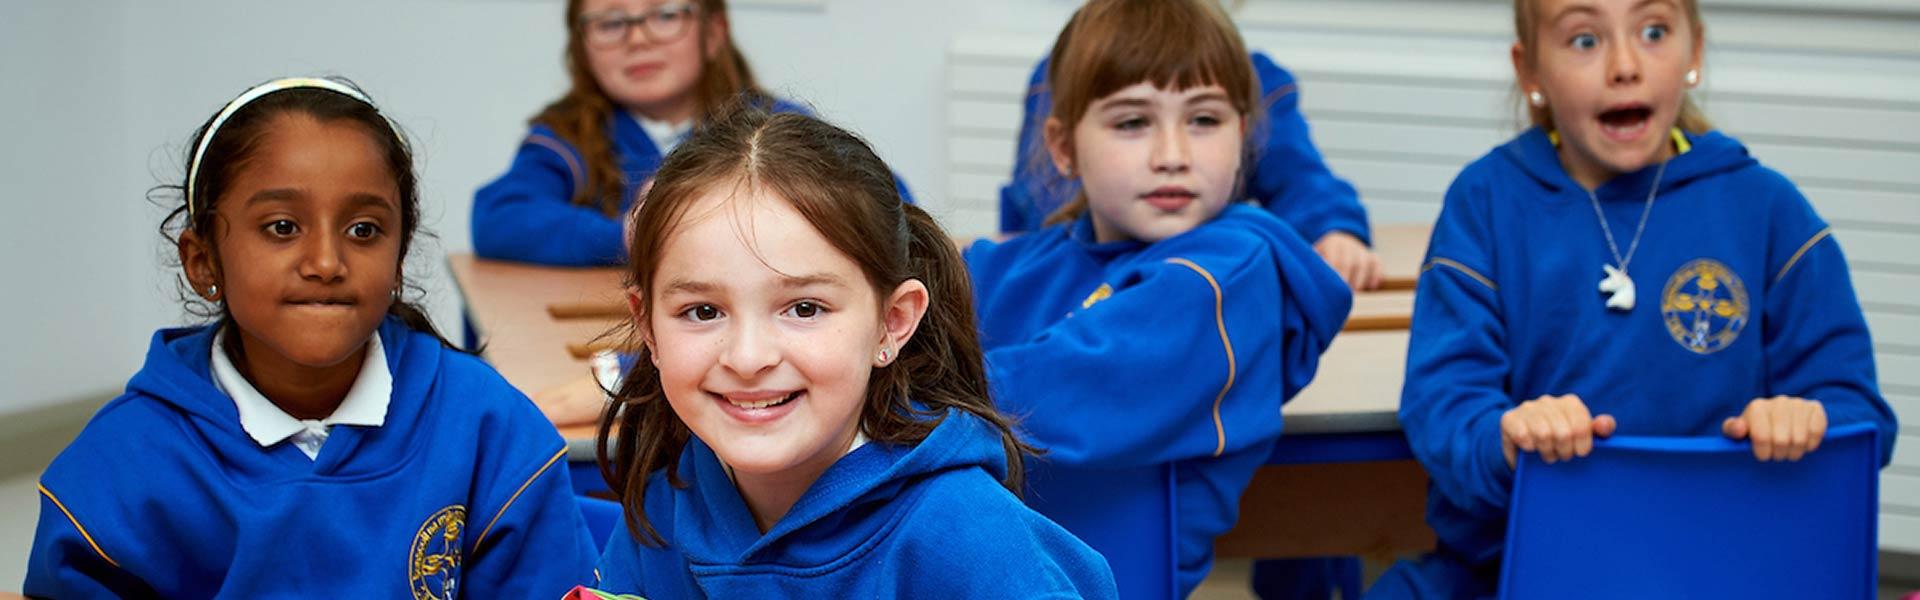 CBS pupils in a classroom